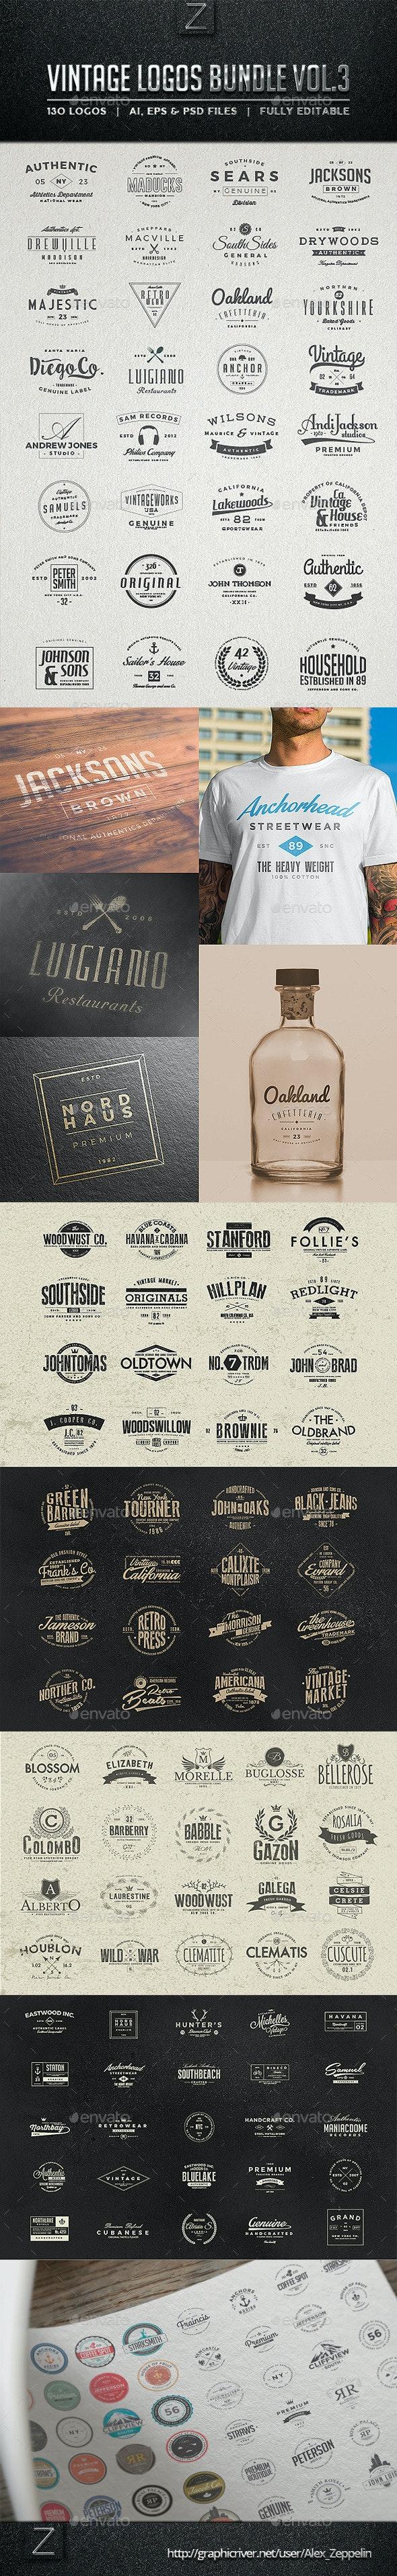 130 Vintage Logos Bundle Vol.3 - Badges & Stickers Web Elements